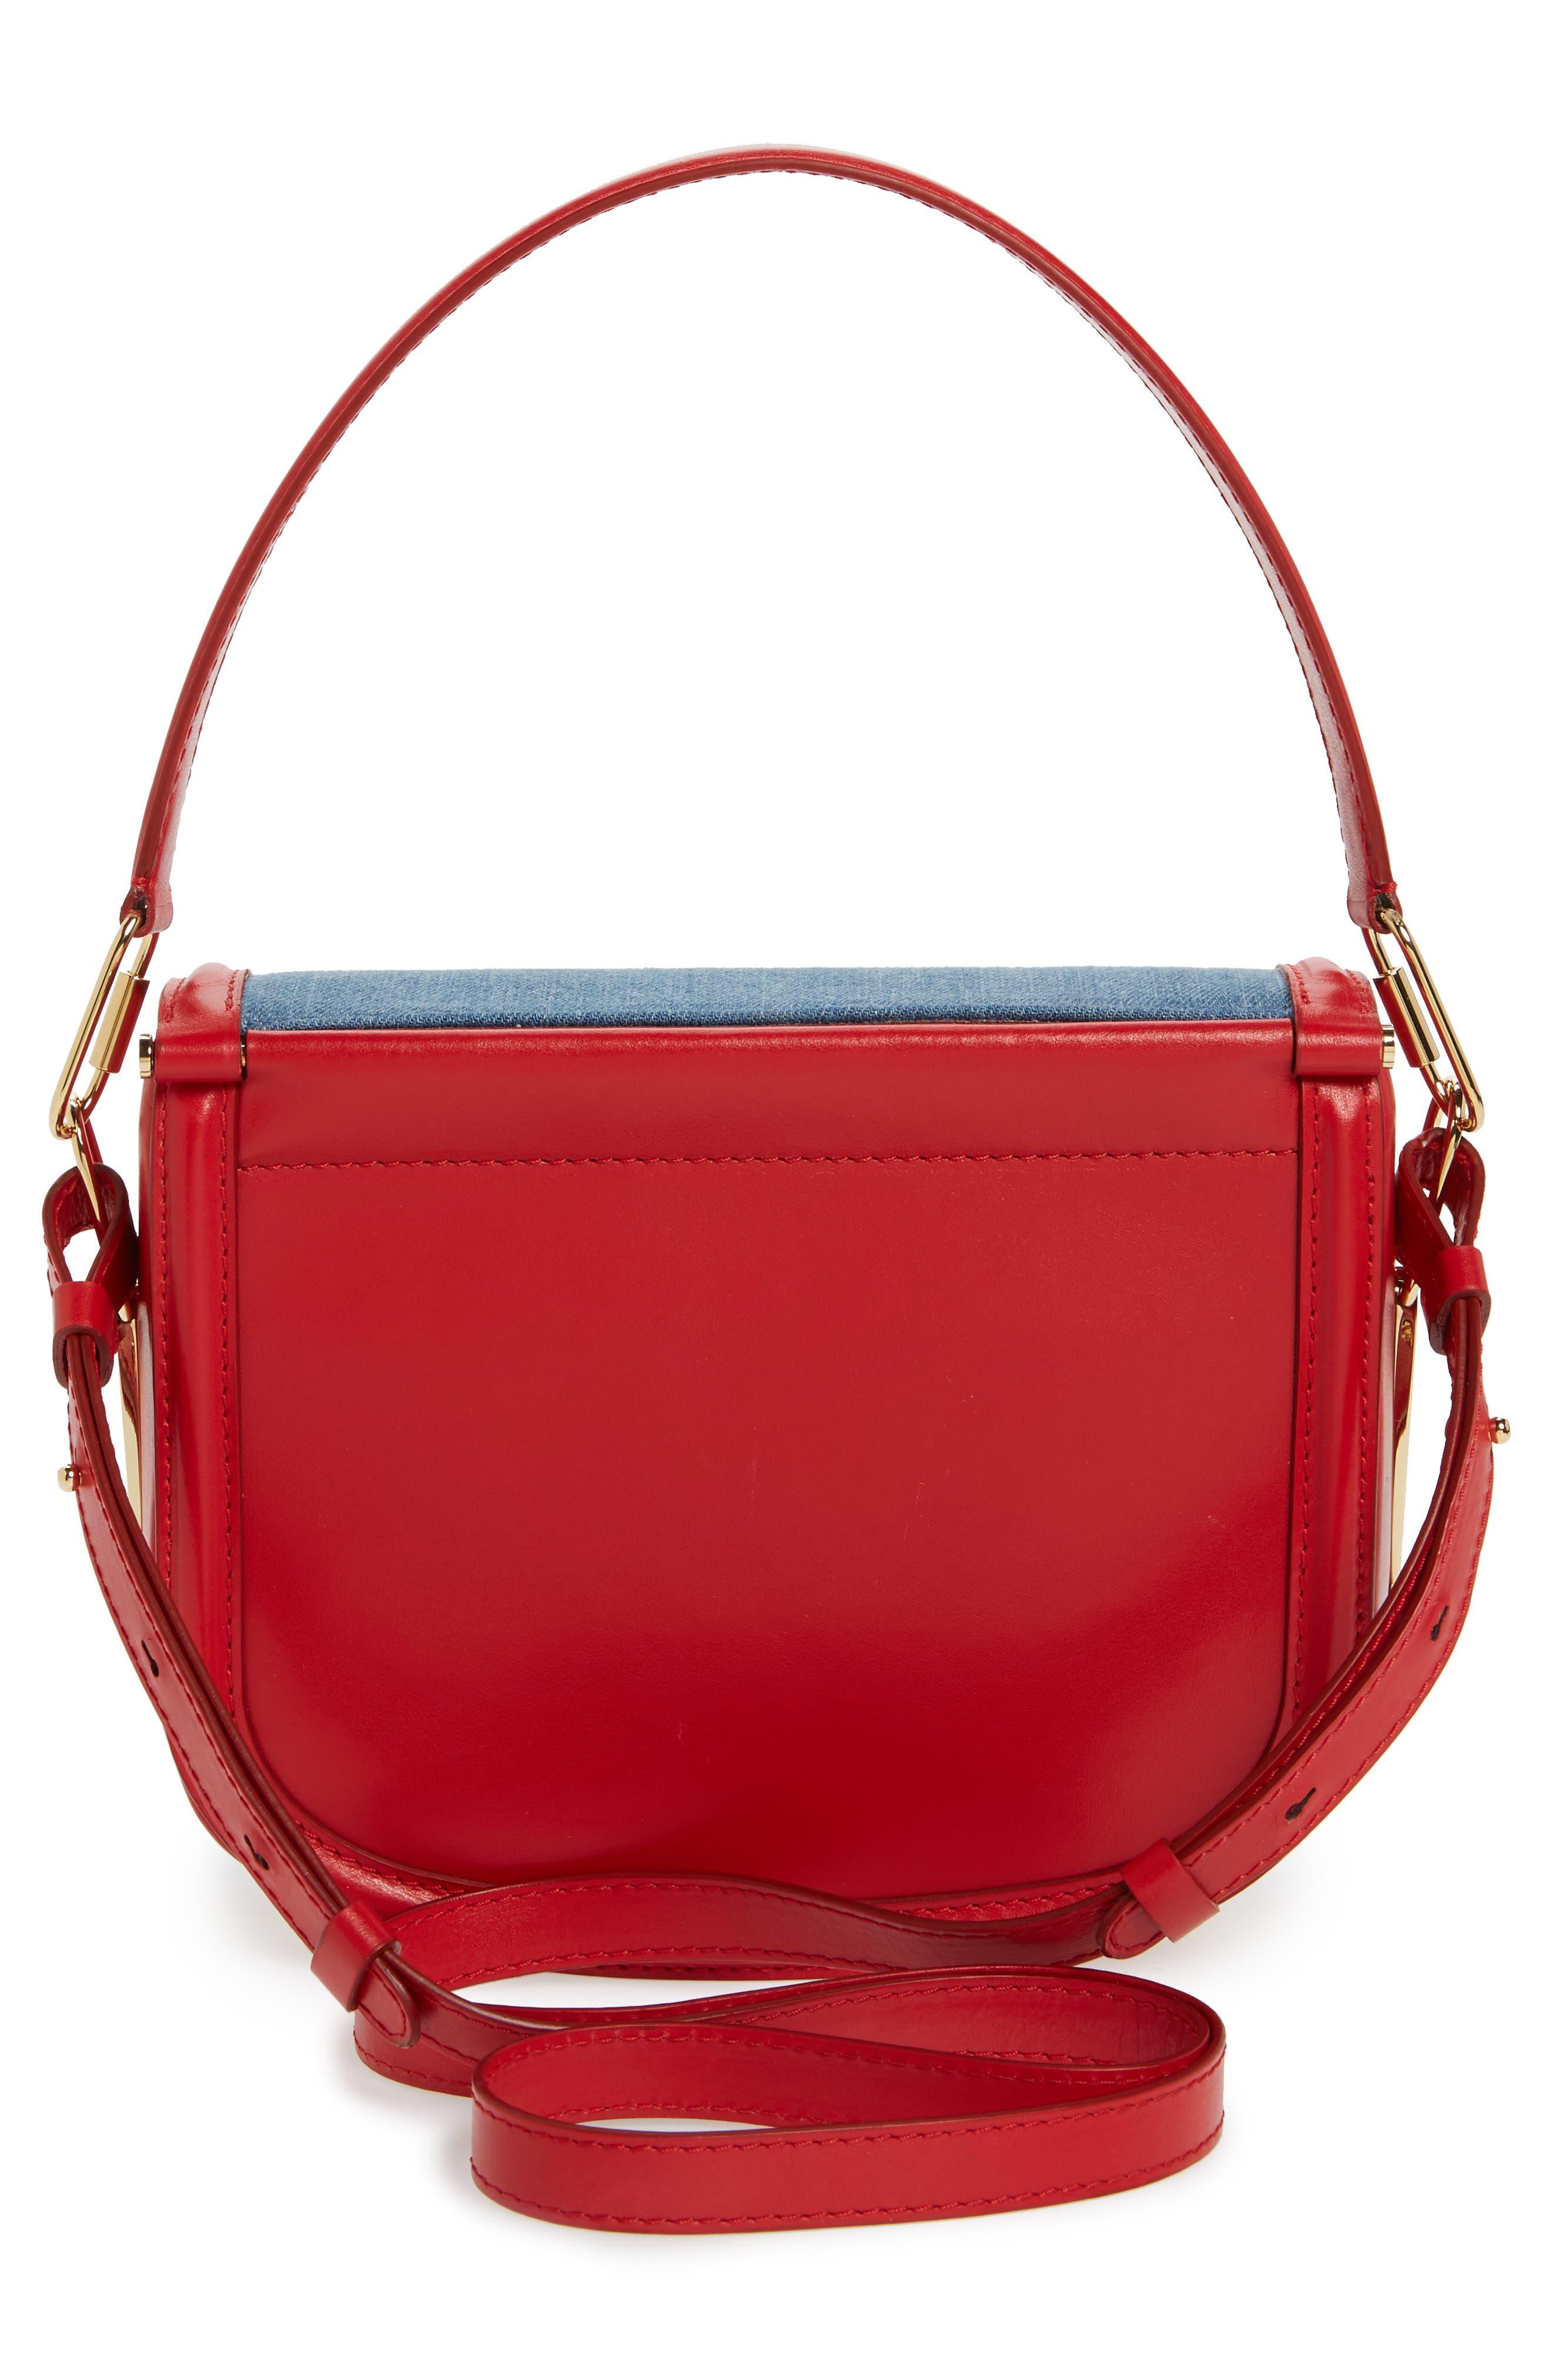 Dutchies Crossbody Bag,                             Alternate thumbnail 2, color,                             Blue